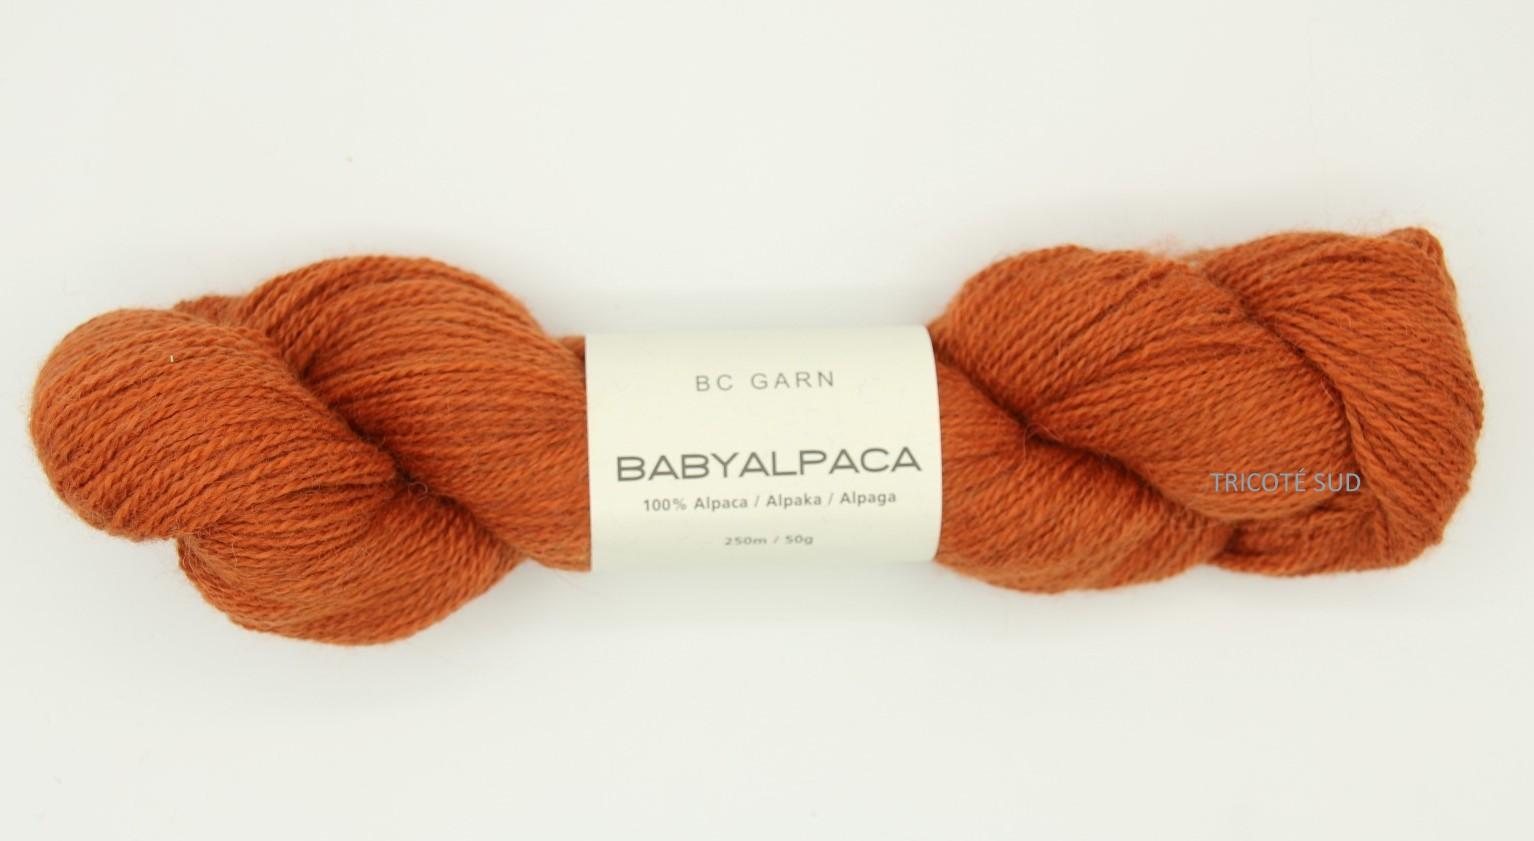 BABY ALPACA BCGARN 38 (Large)